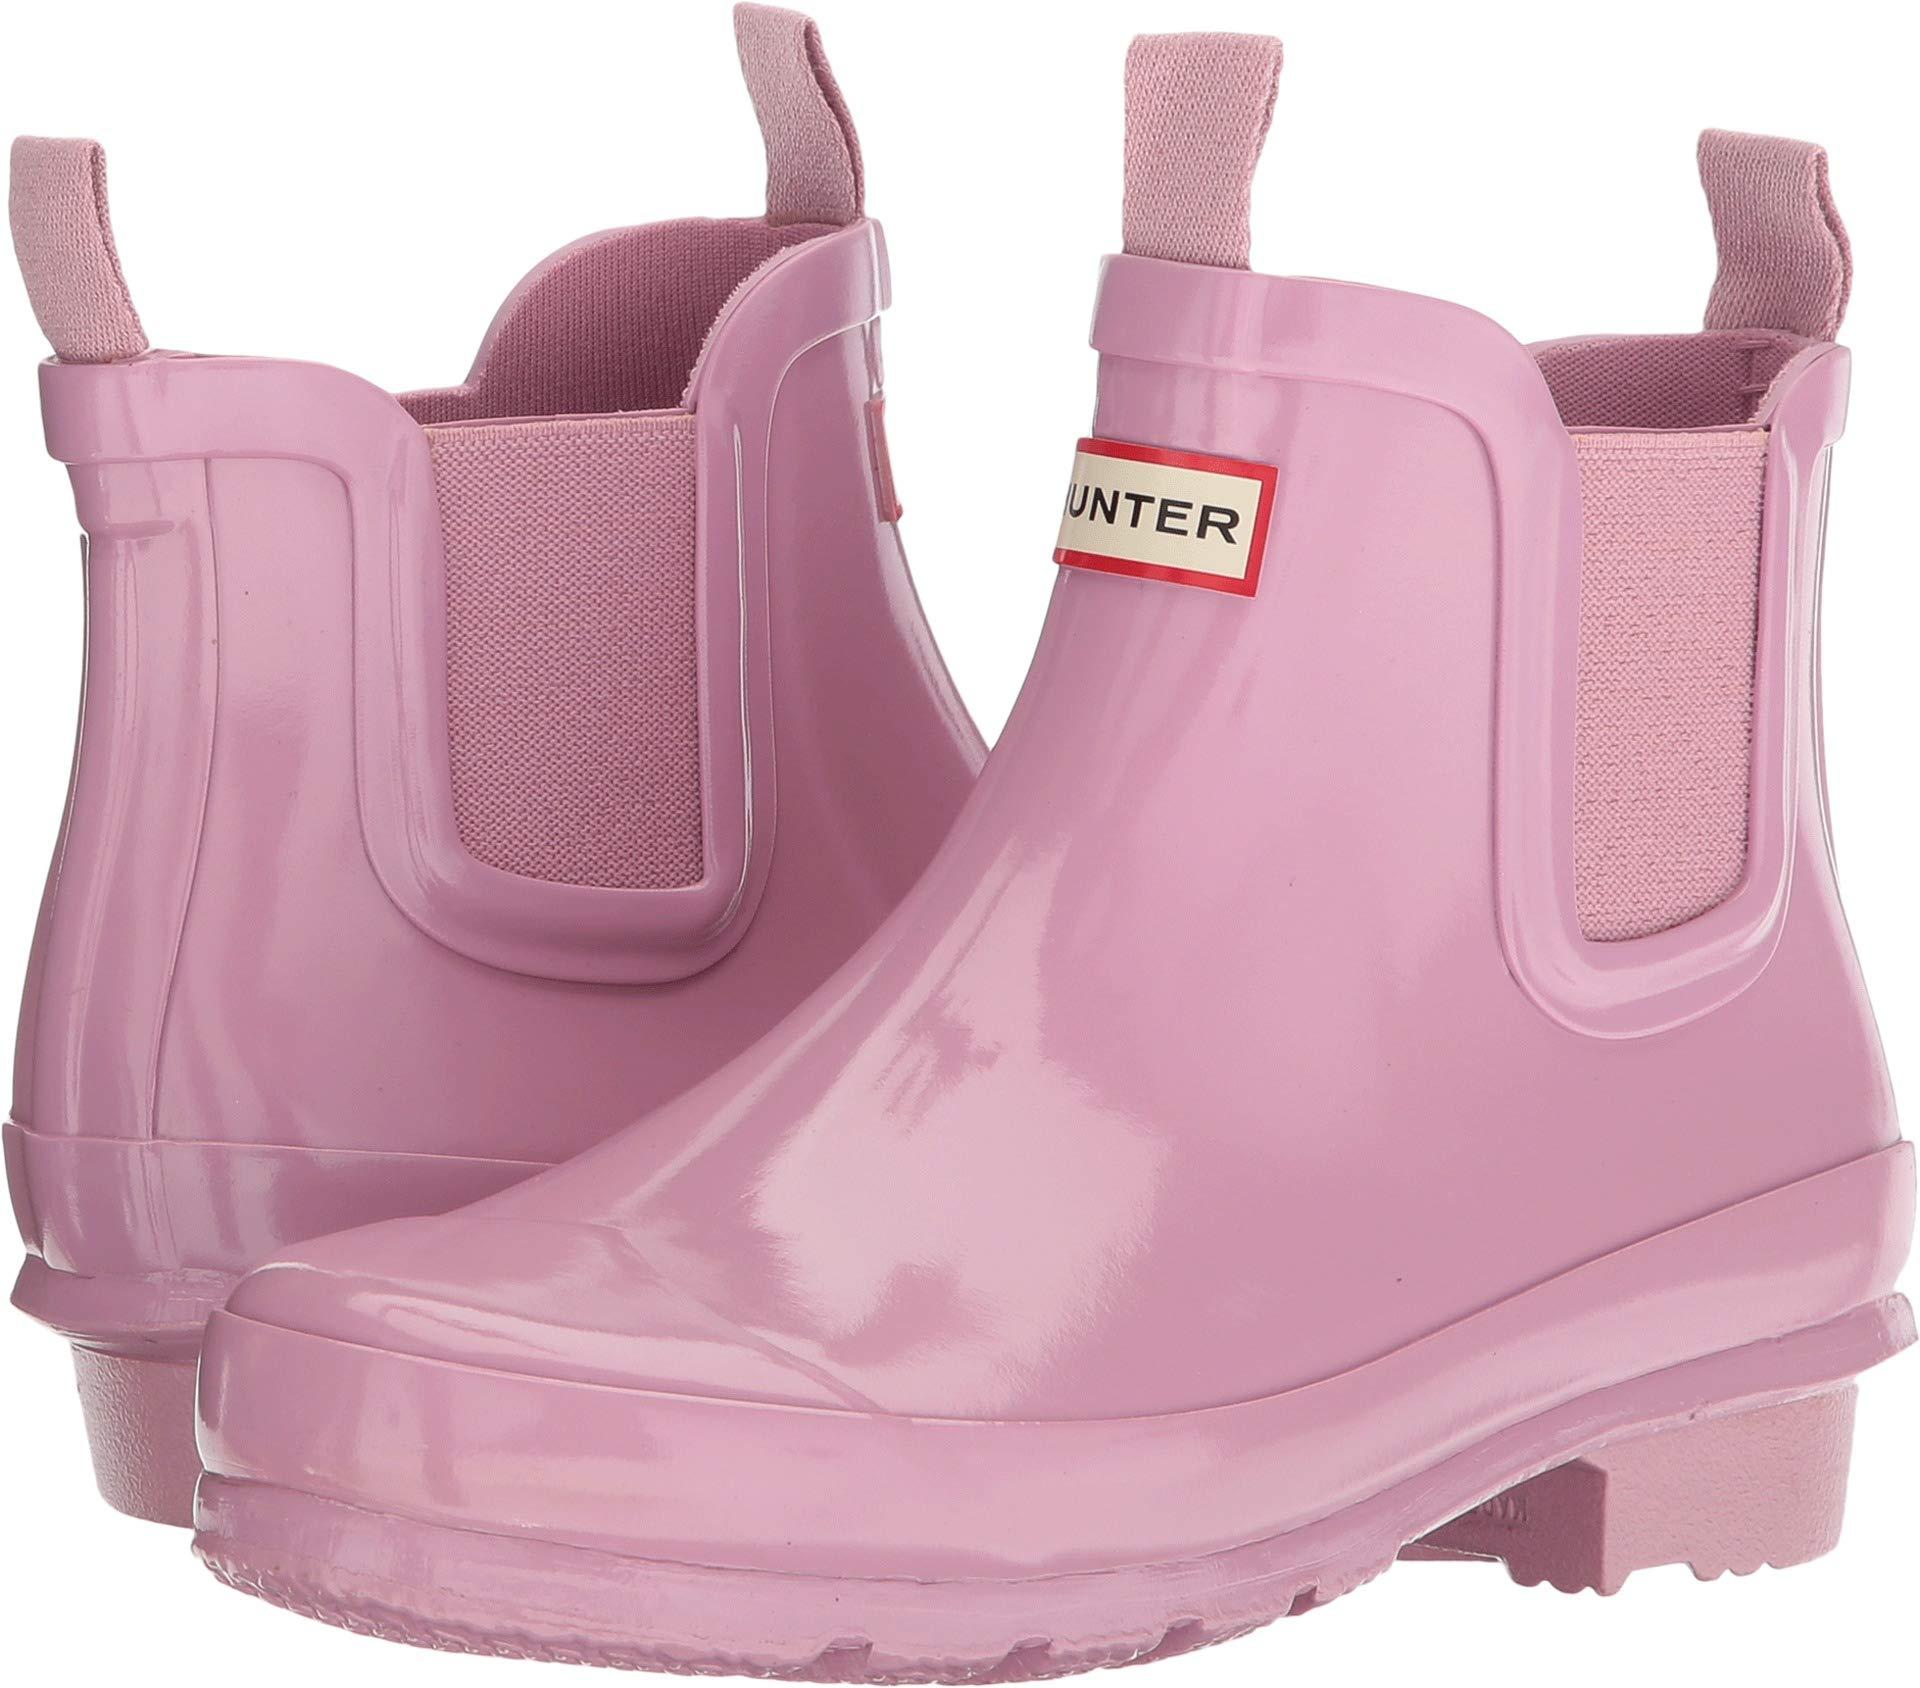 Hunter Kids Unisex Chelsea Gloss Rain Boots (Little Kid/Big Kid) Blossom 4 M US Big Kid